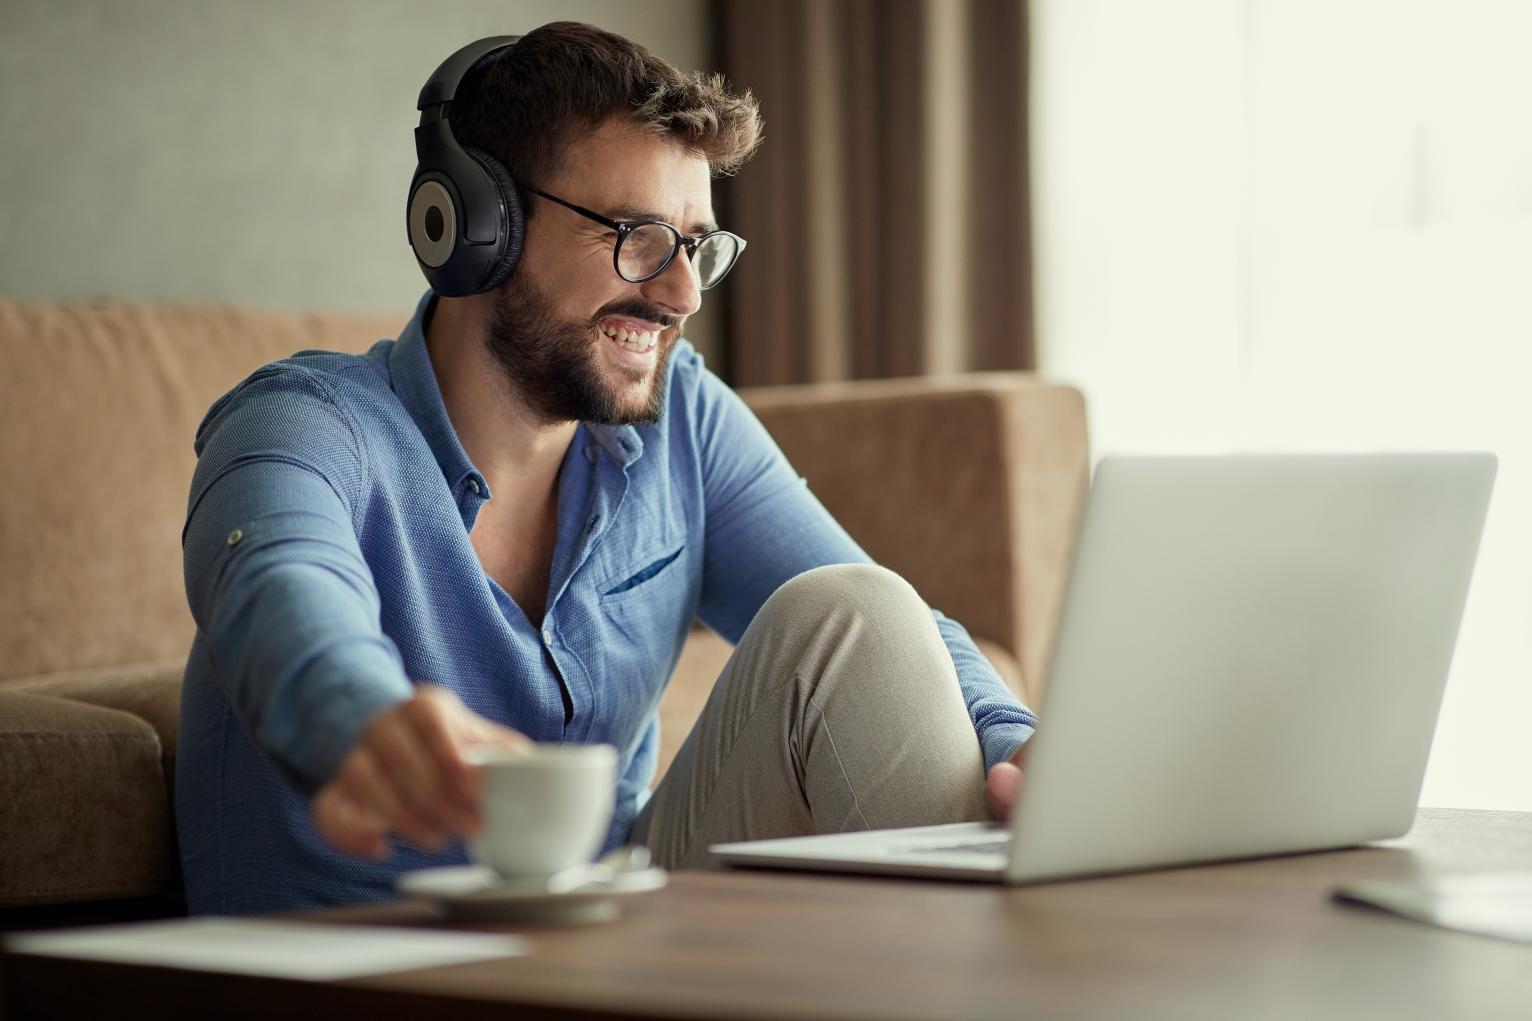 Hombre disfrutando un podcast